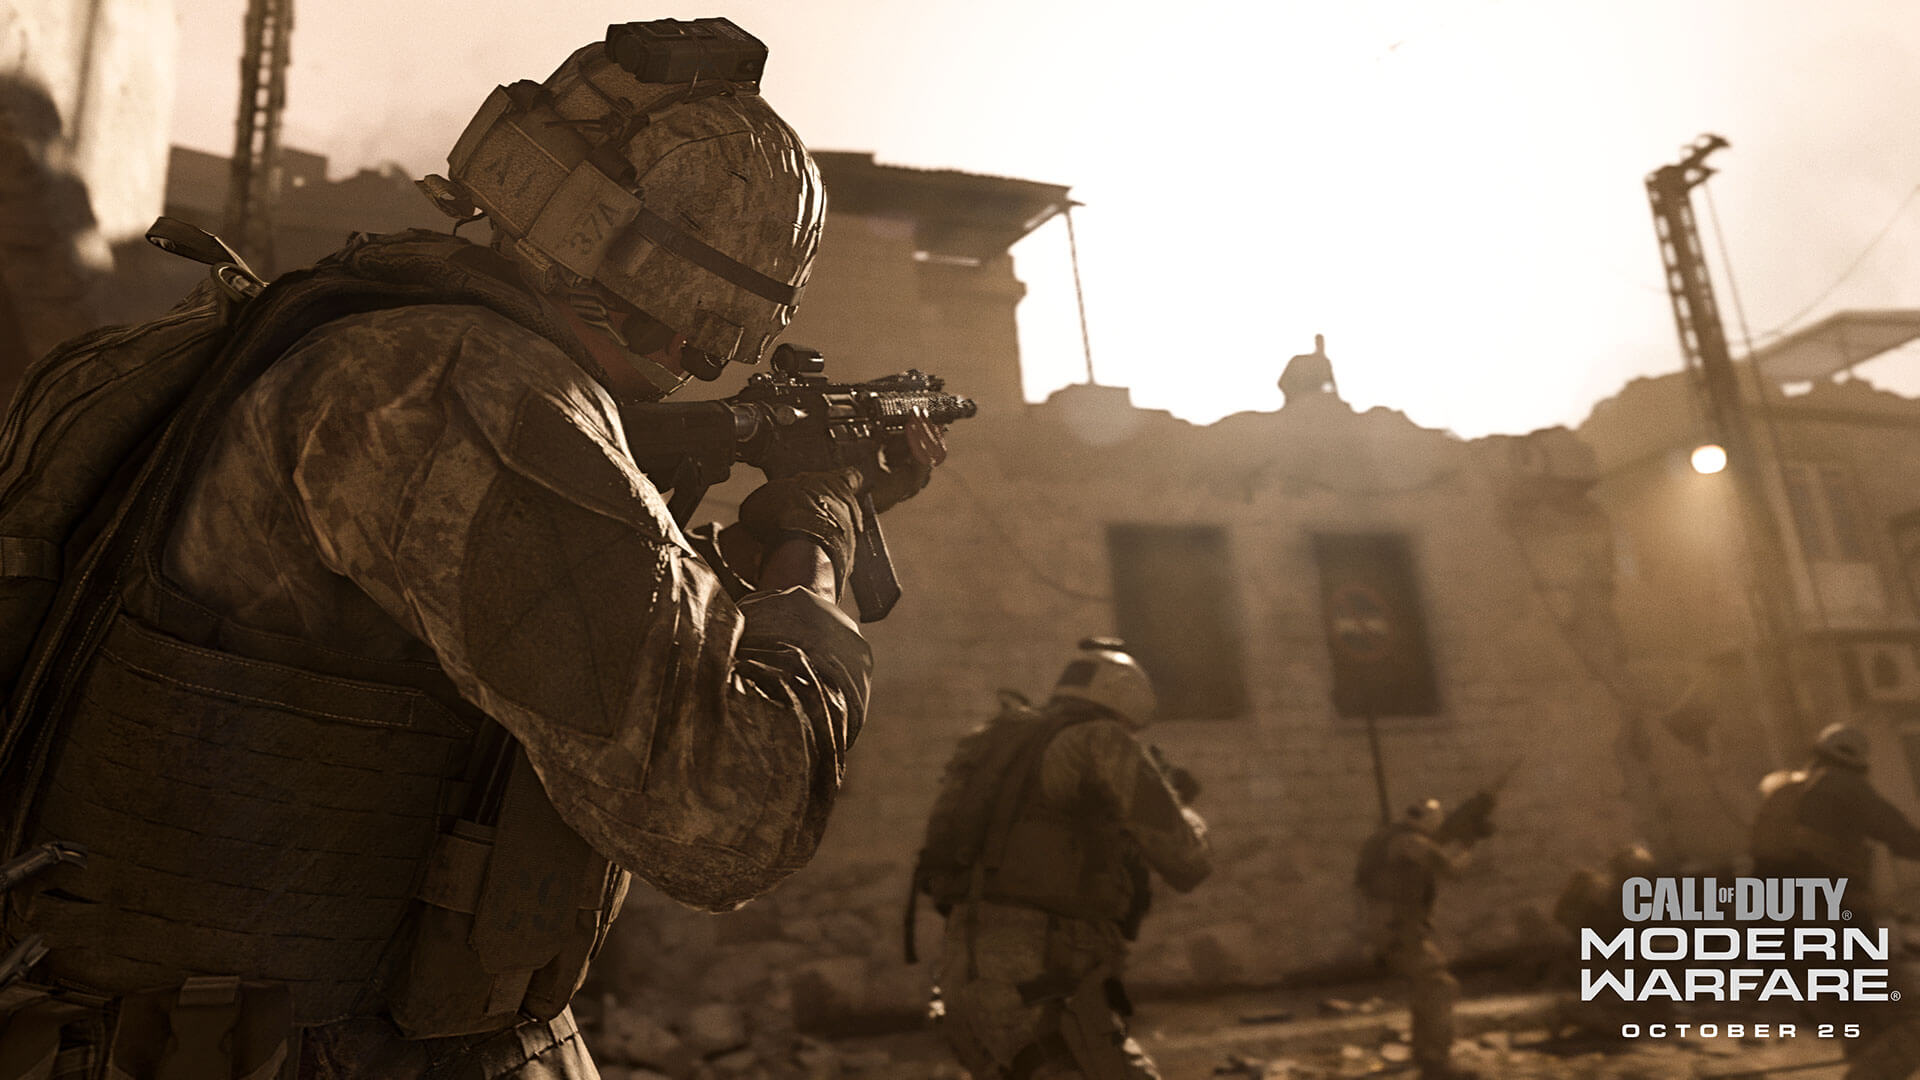 Call of Duty Modern Warfare usará fotogrametria